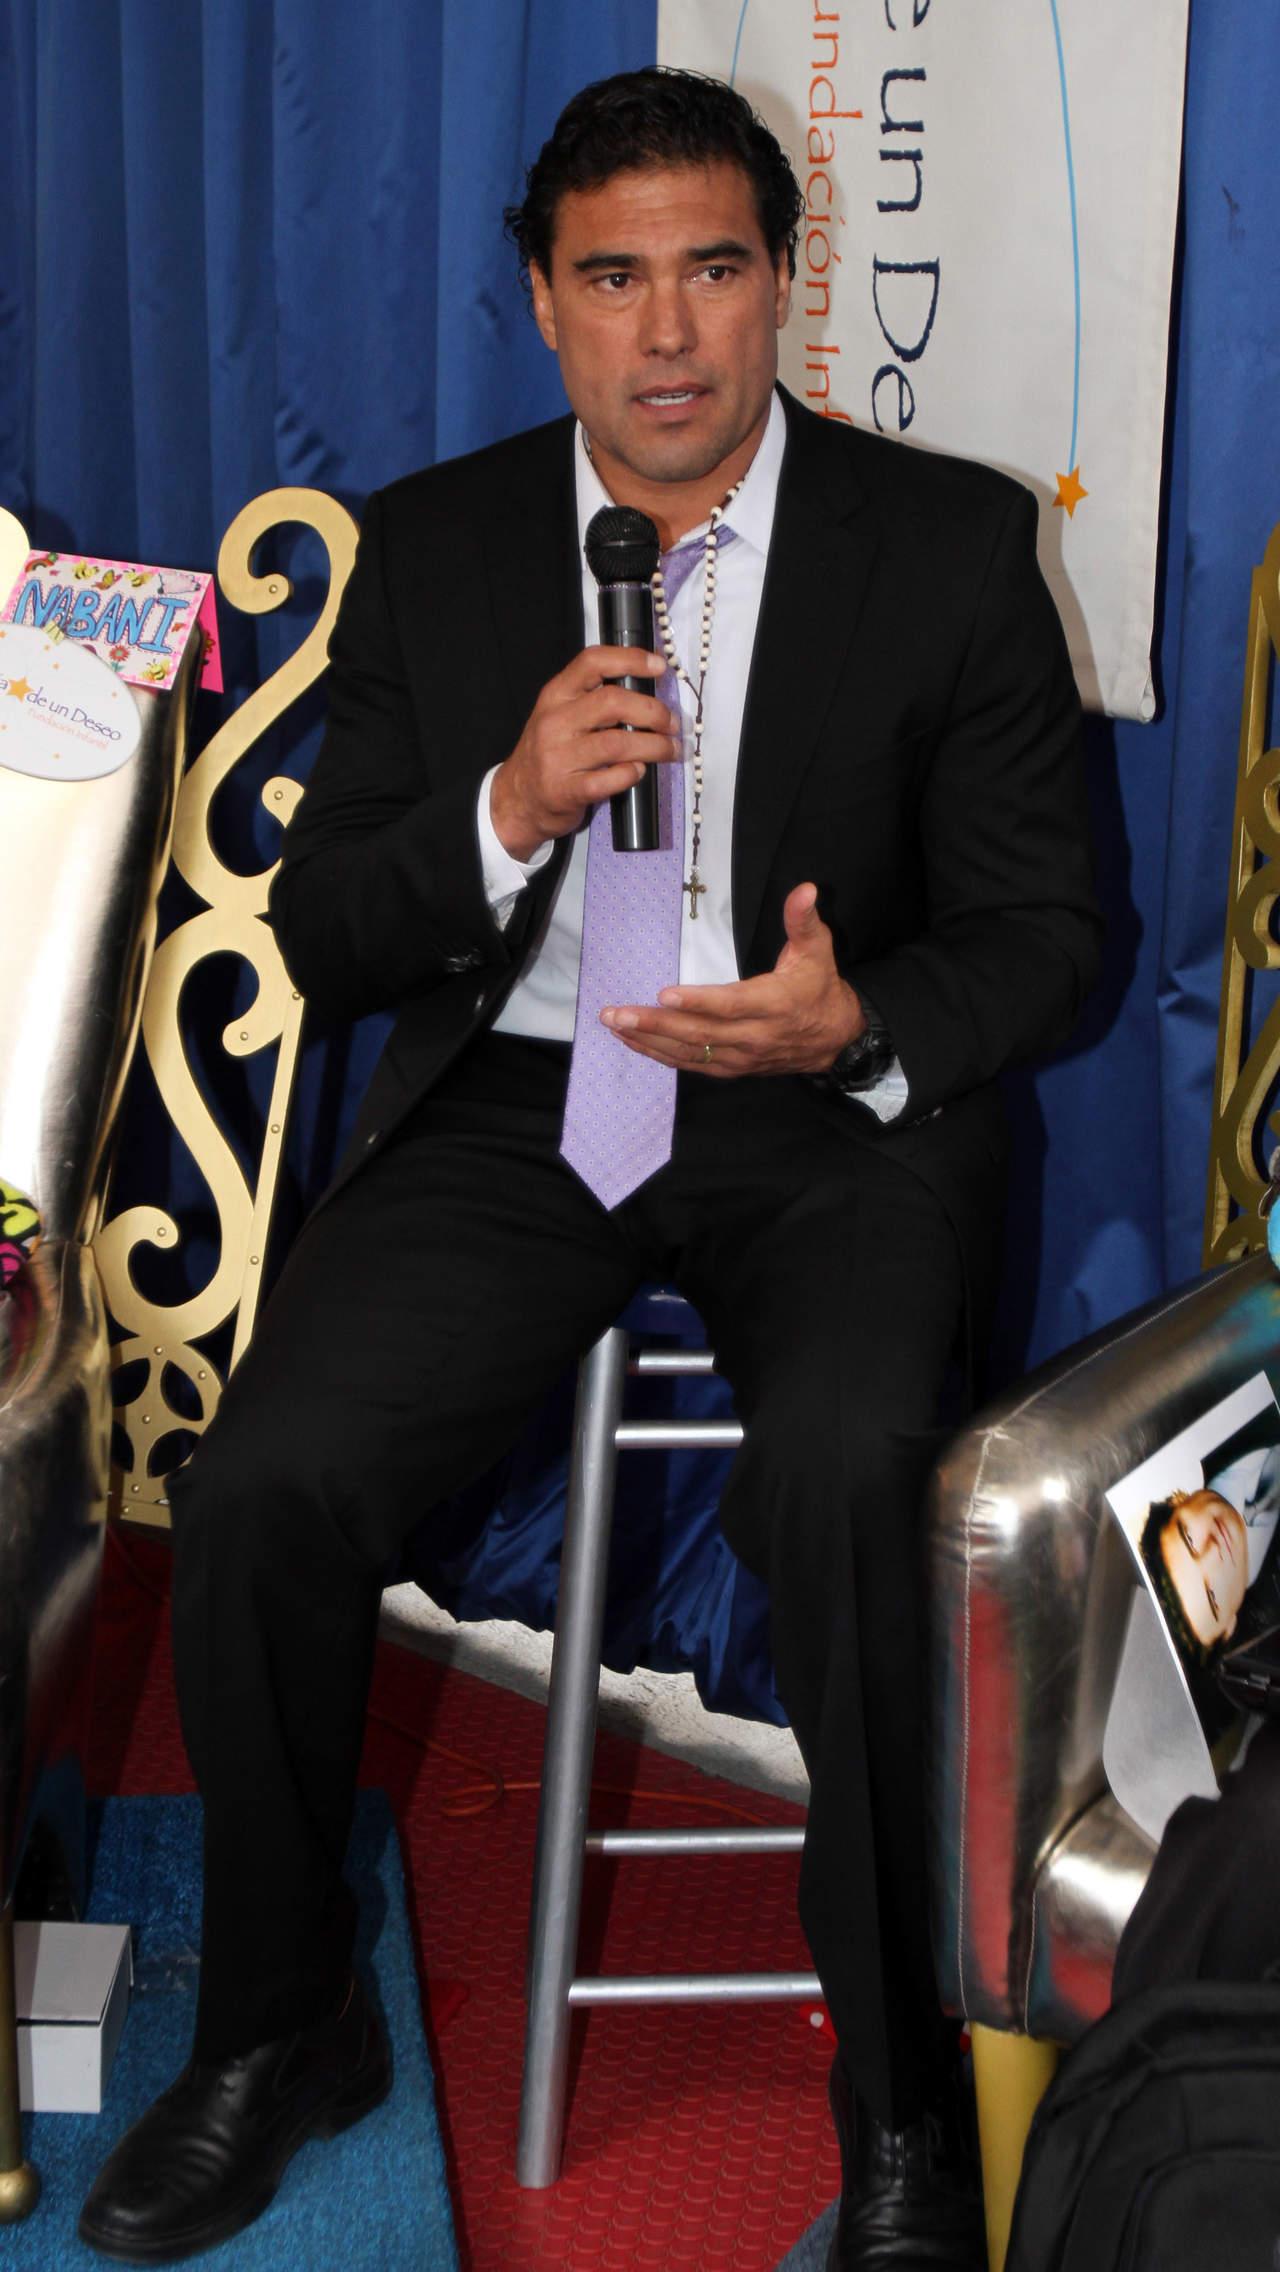 Agradece reportero agredido por Eduardo Yáñez apoyo